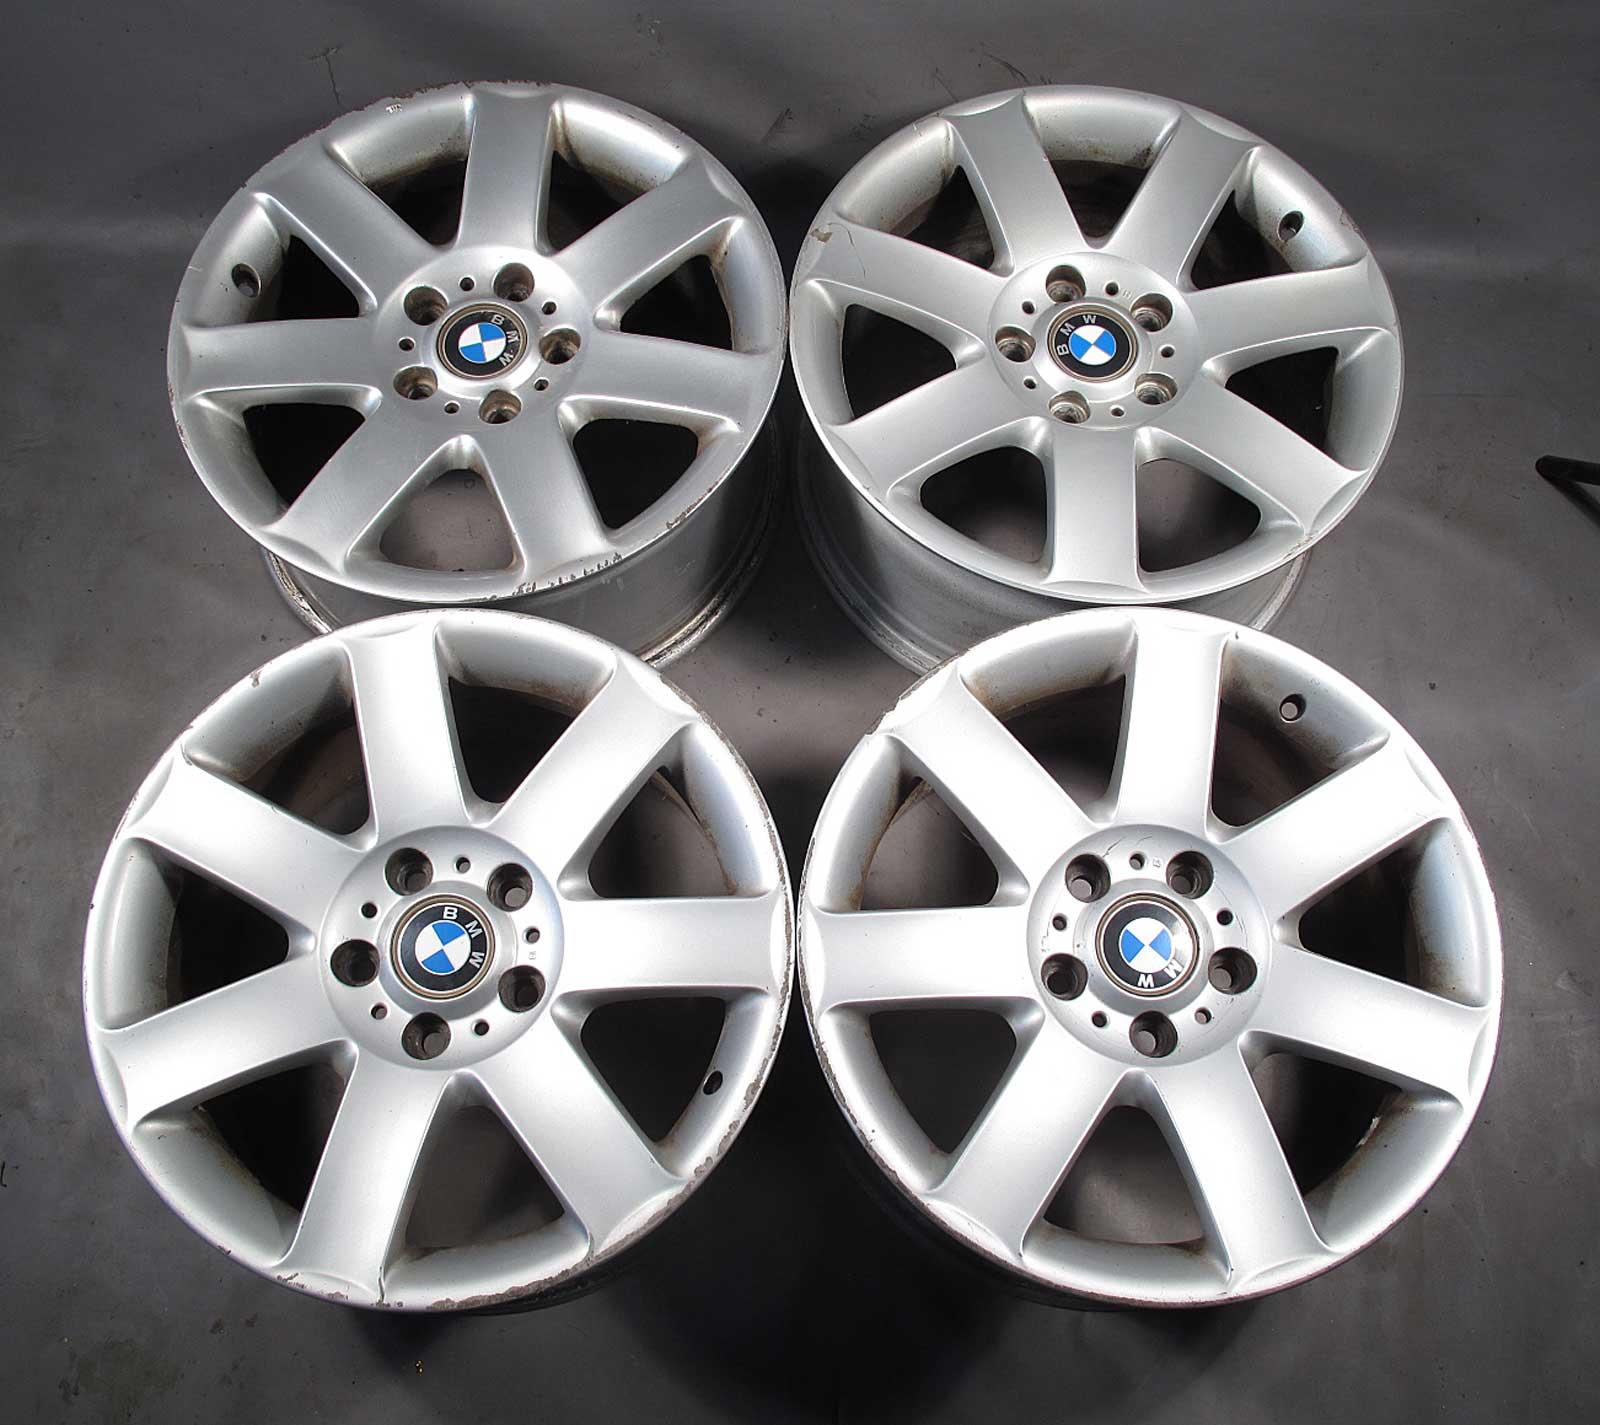 carsaddiction rim bmw com en style styles wheels